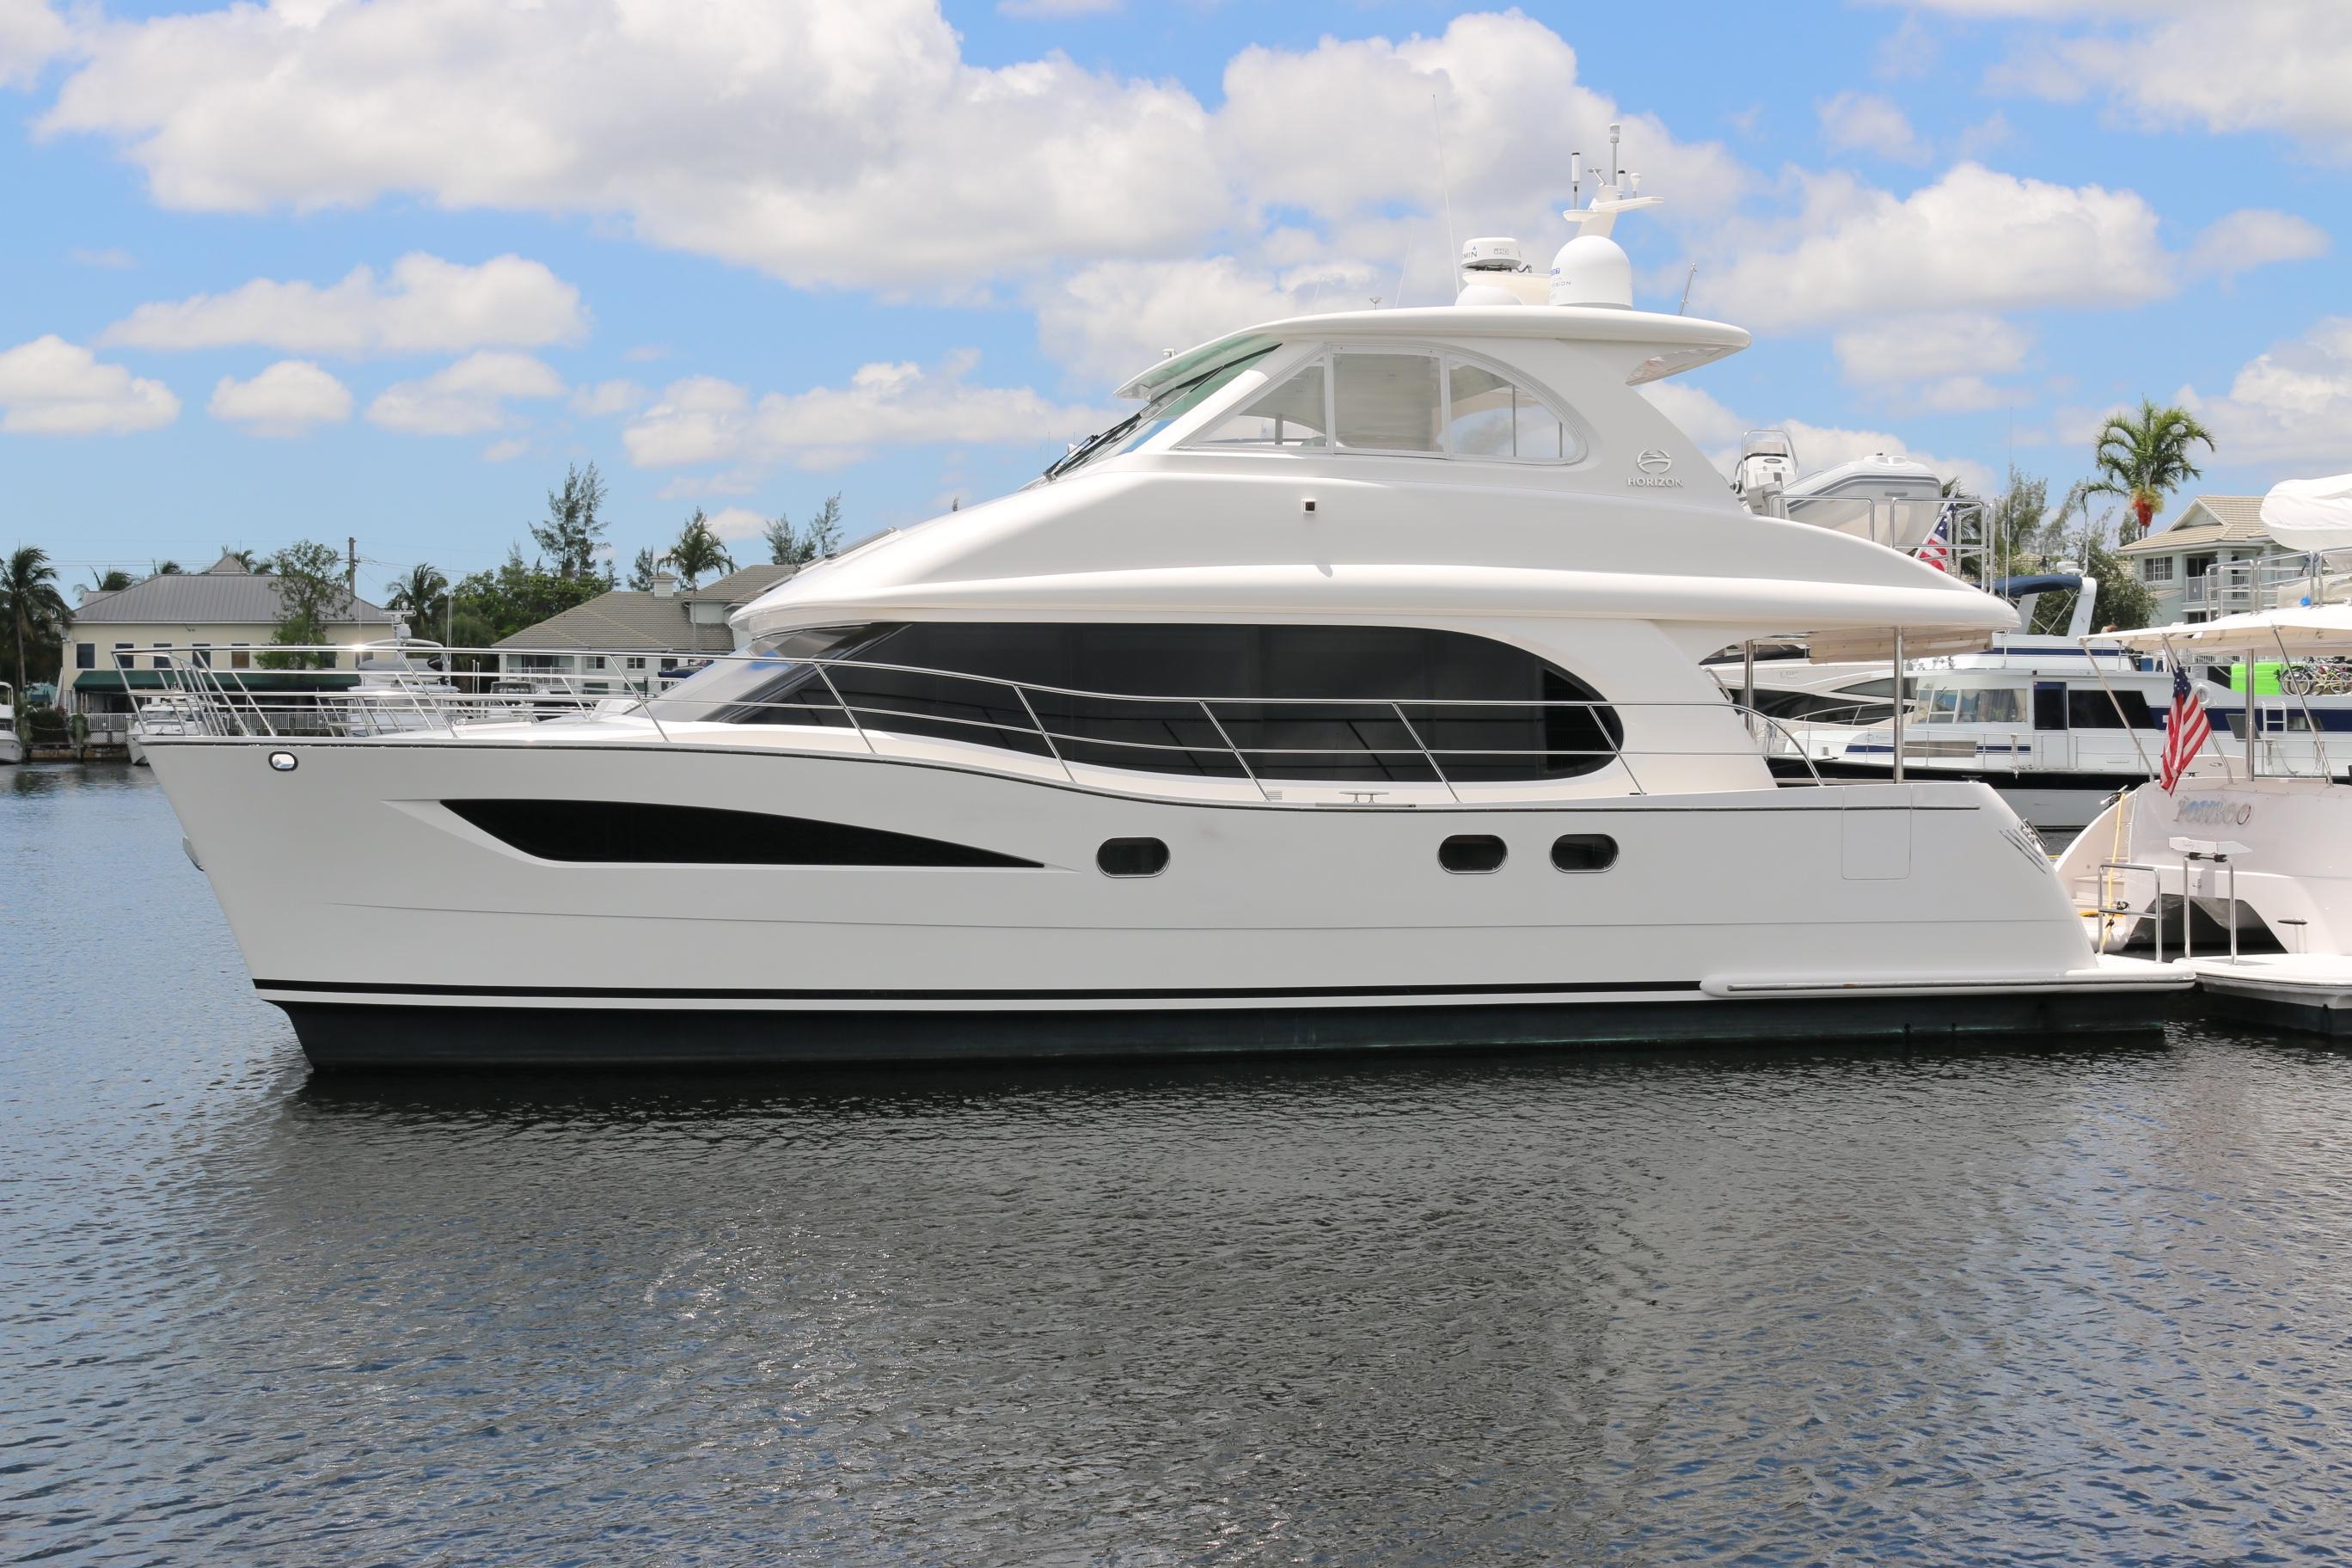 Used Power Catamaran for Sale 2015 Horizon PC52